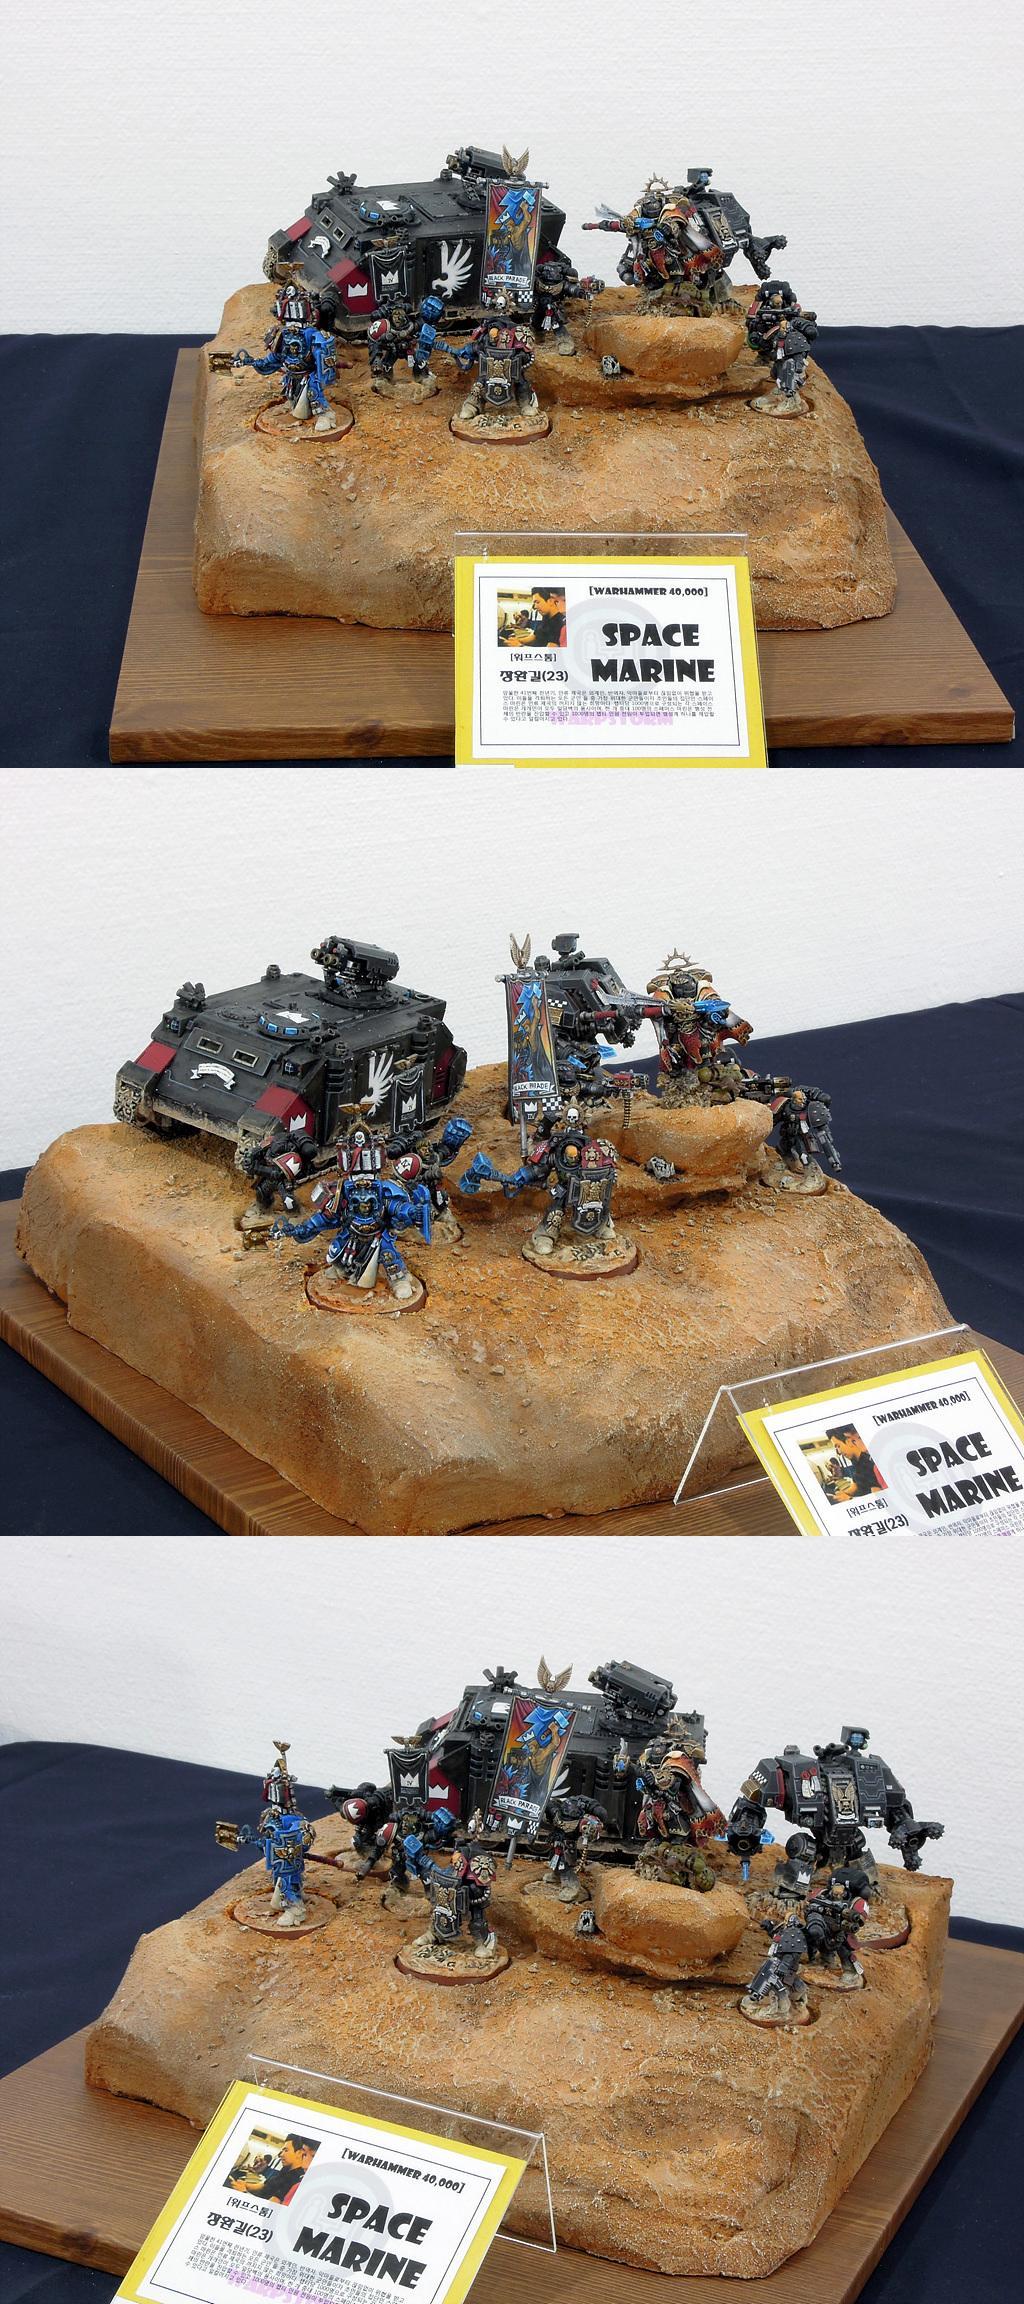 Diorama, Display, Exhibition, Infinity, Space Marines, Warhammer 40,000, Warhammer Fantasy